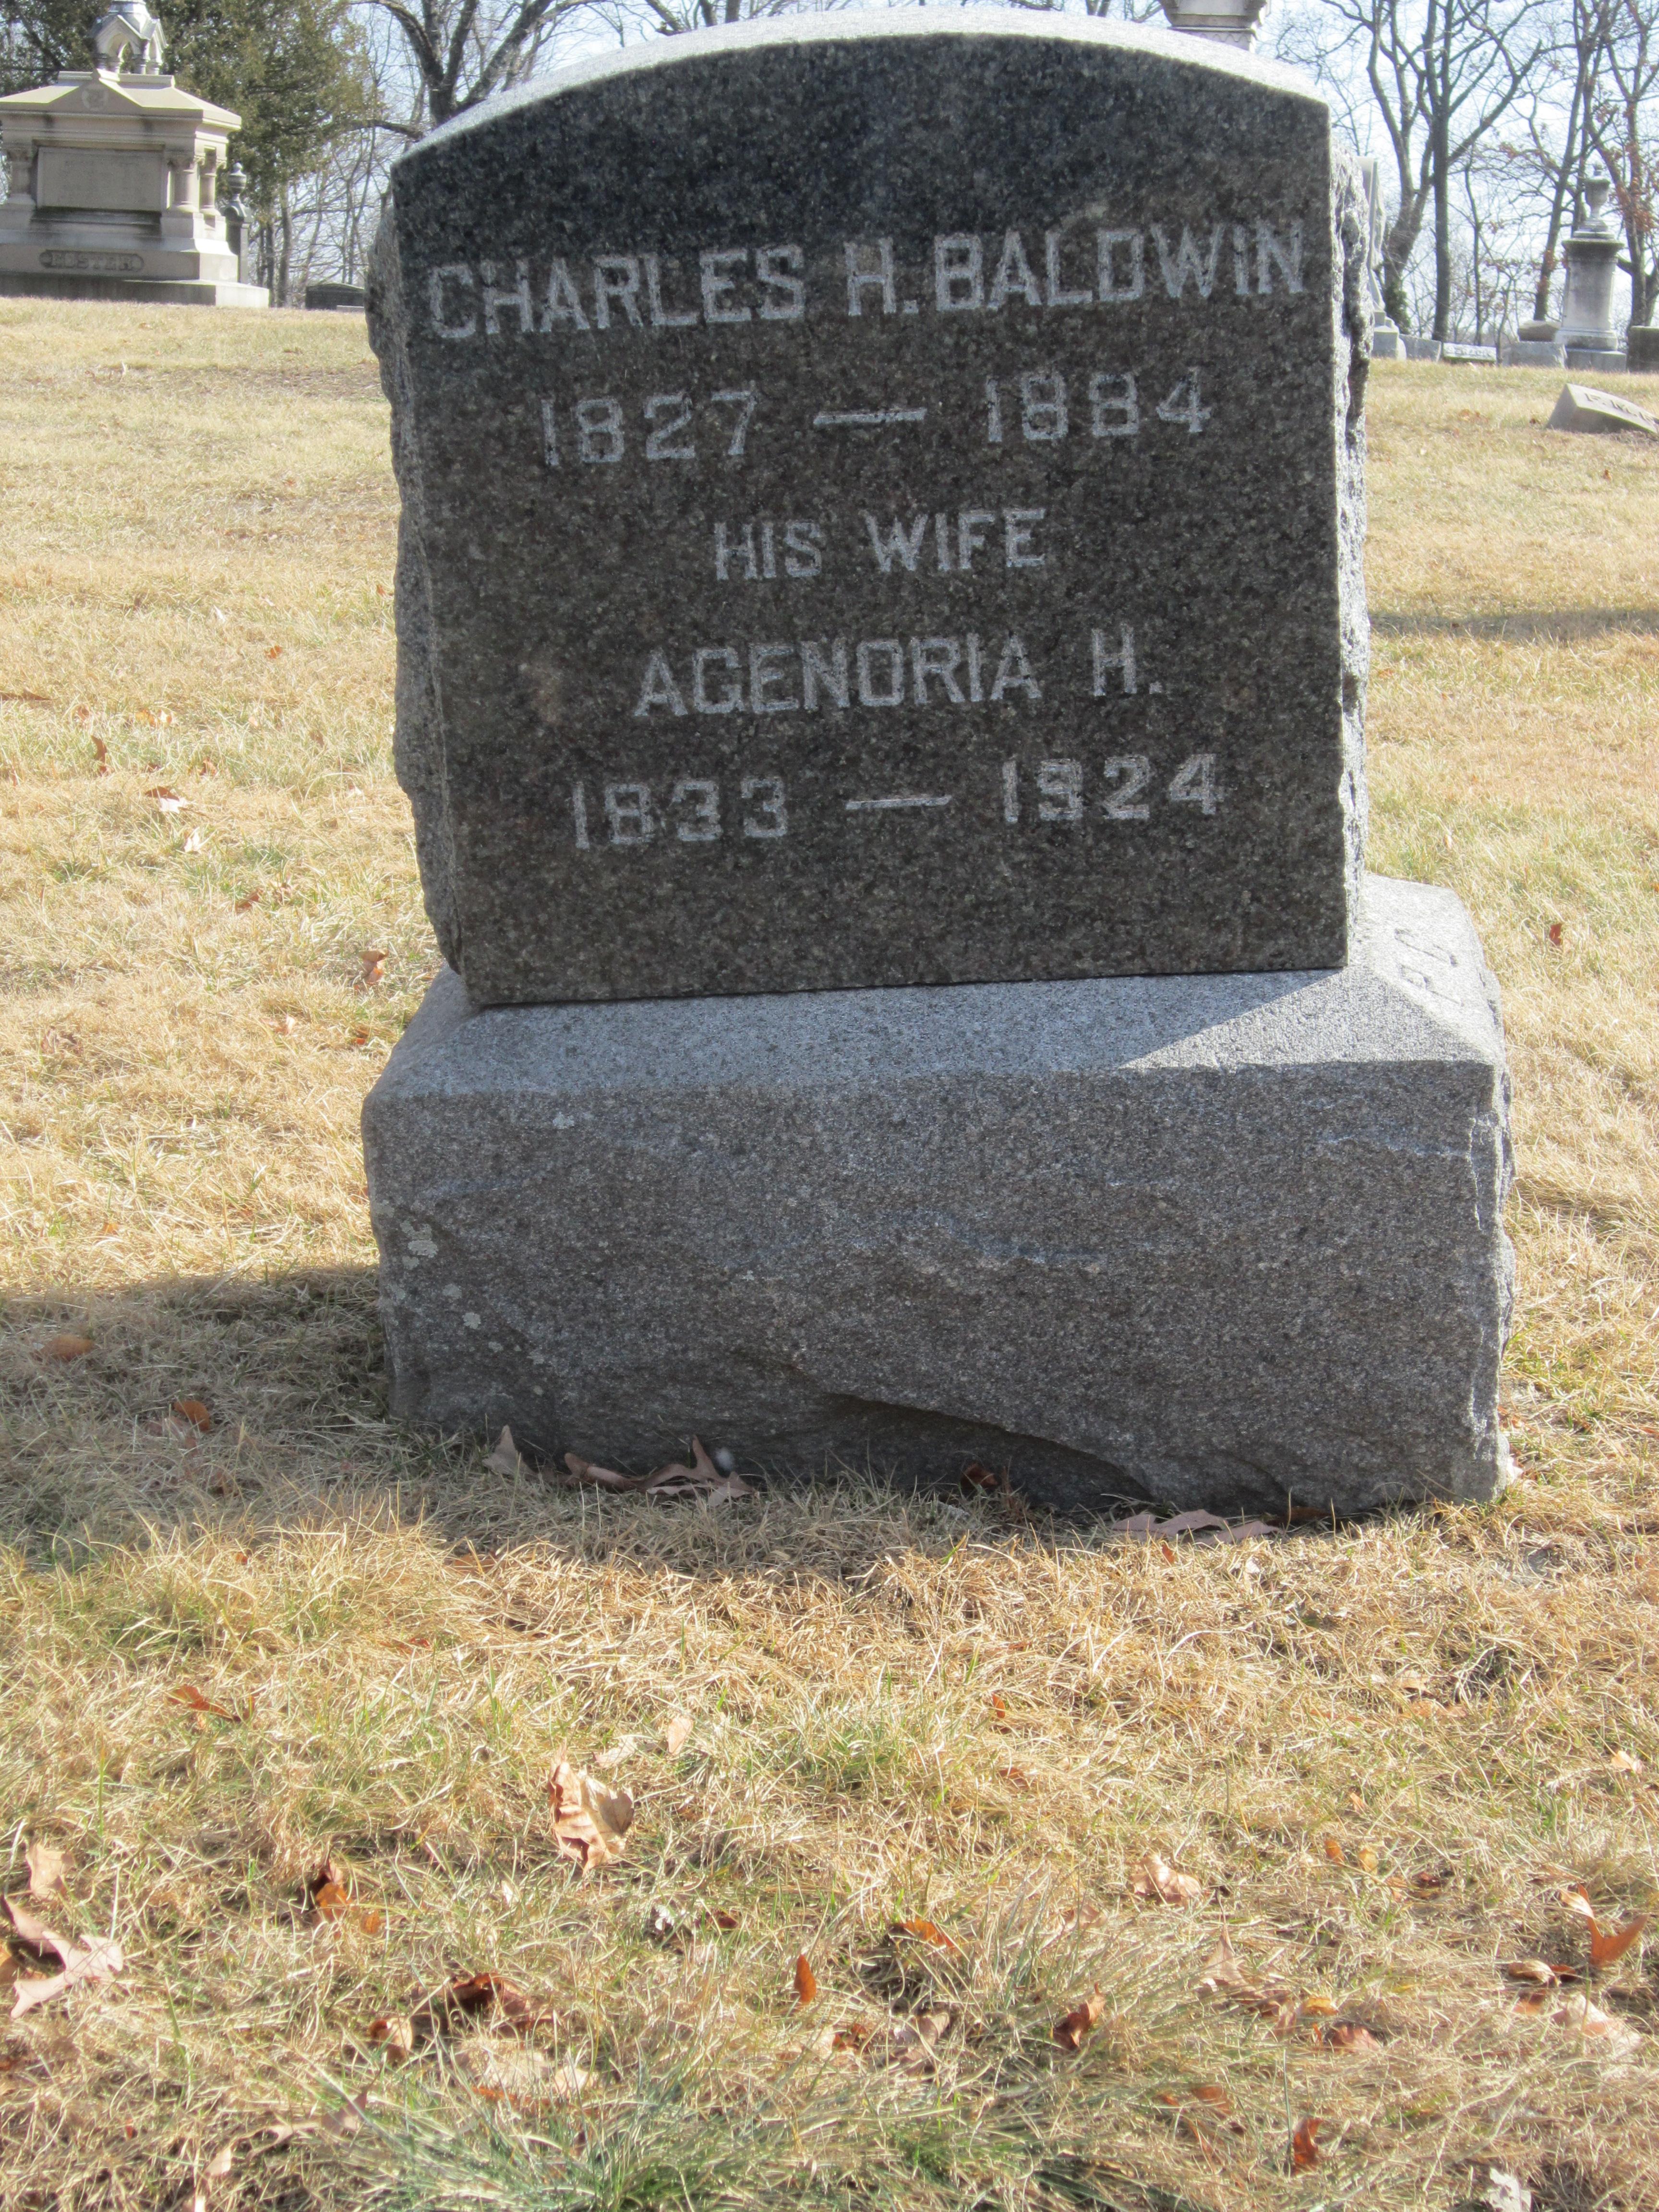 Agenoria H. Baldwin